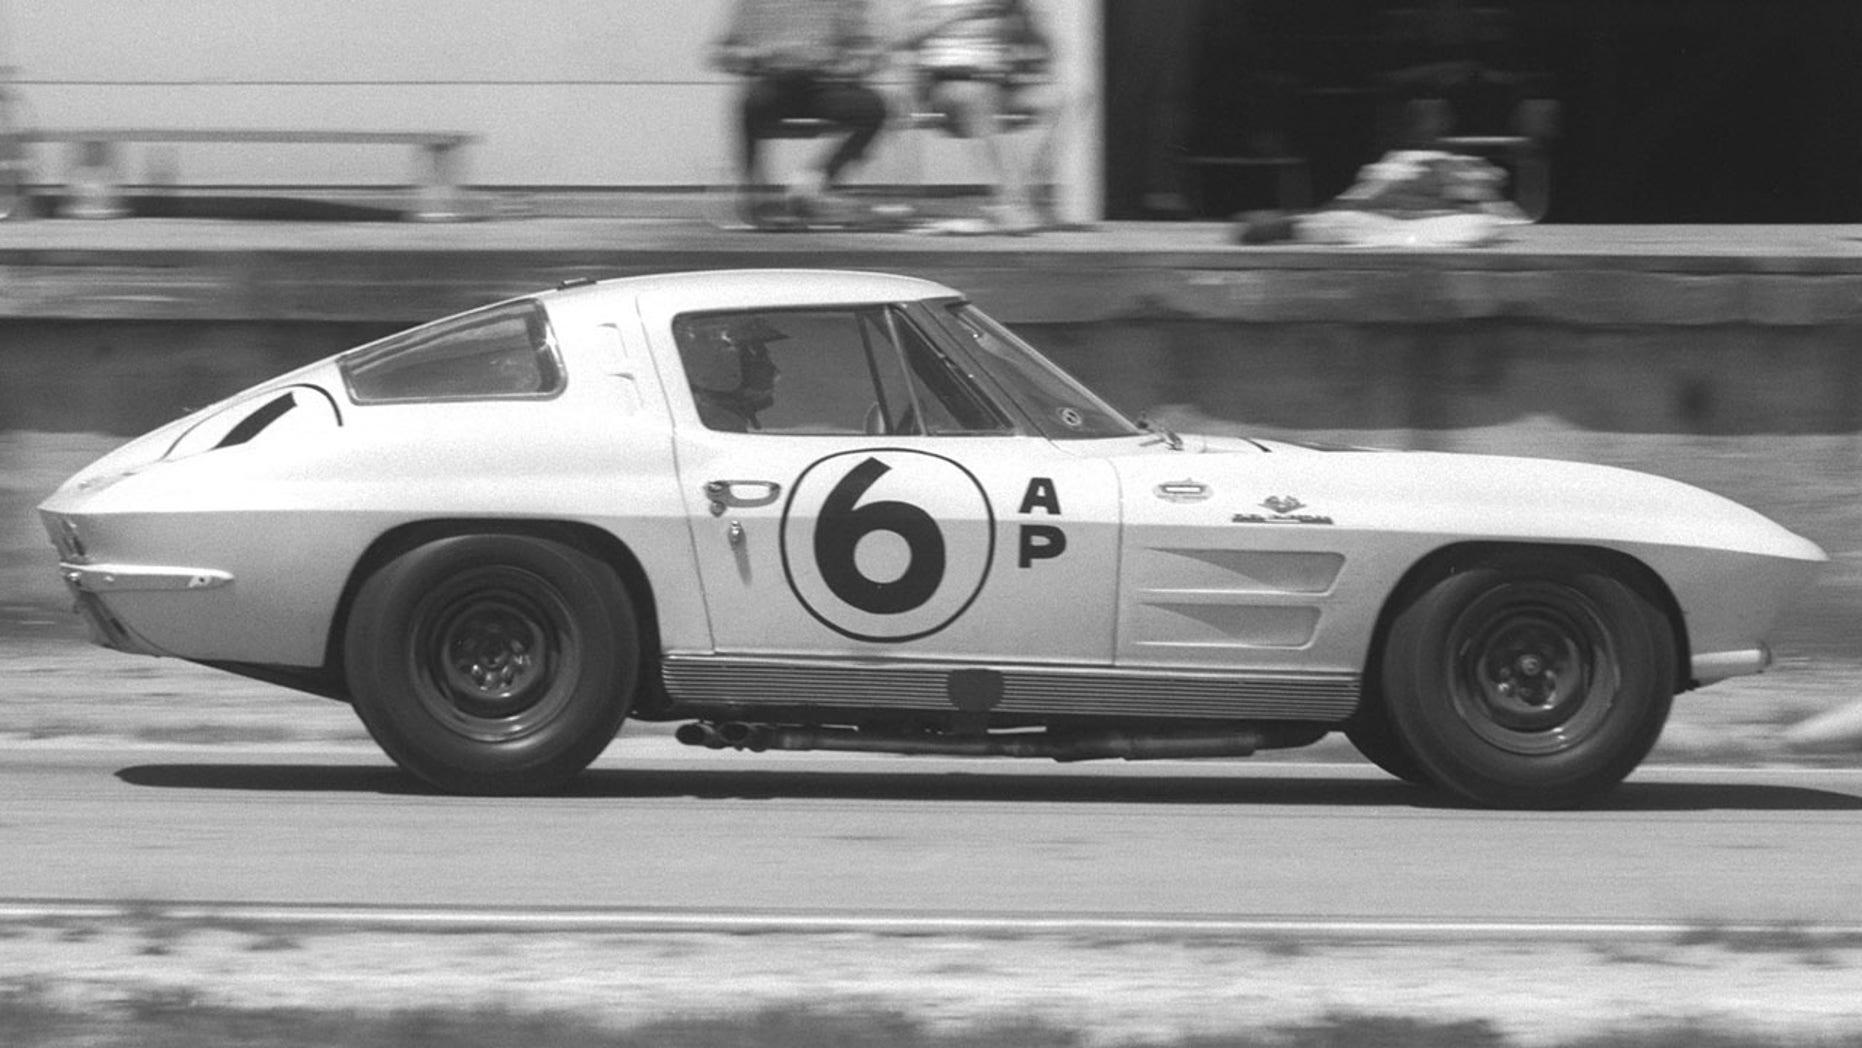 4-seat 1963 Chevrolet Corvette